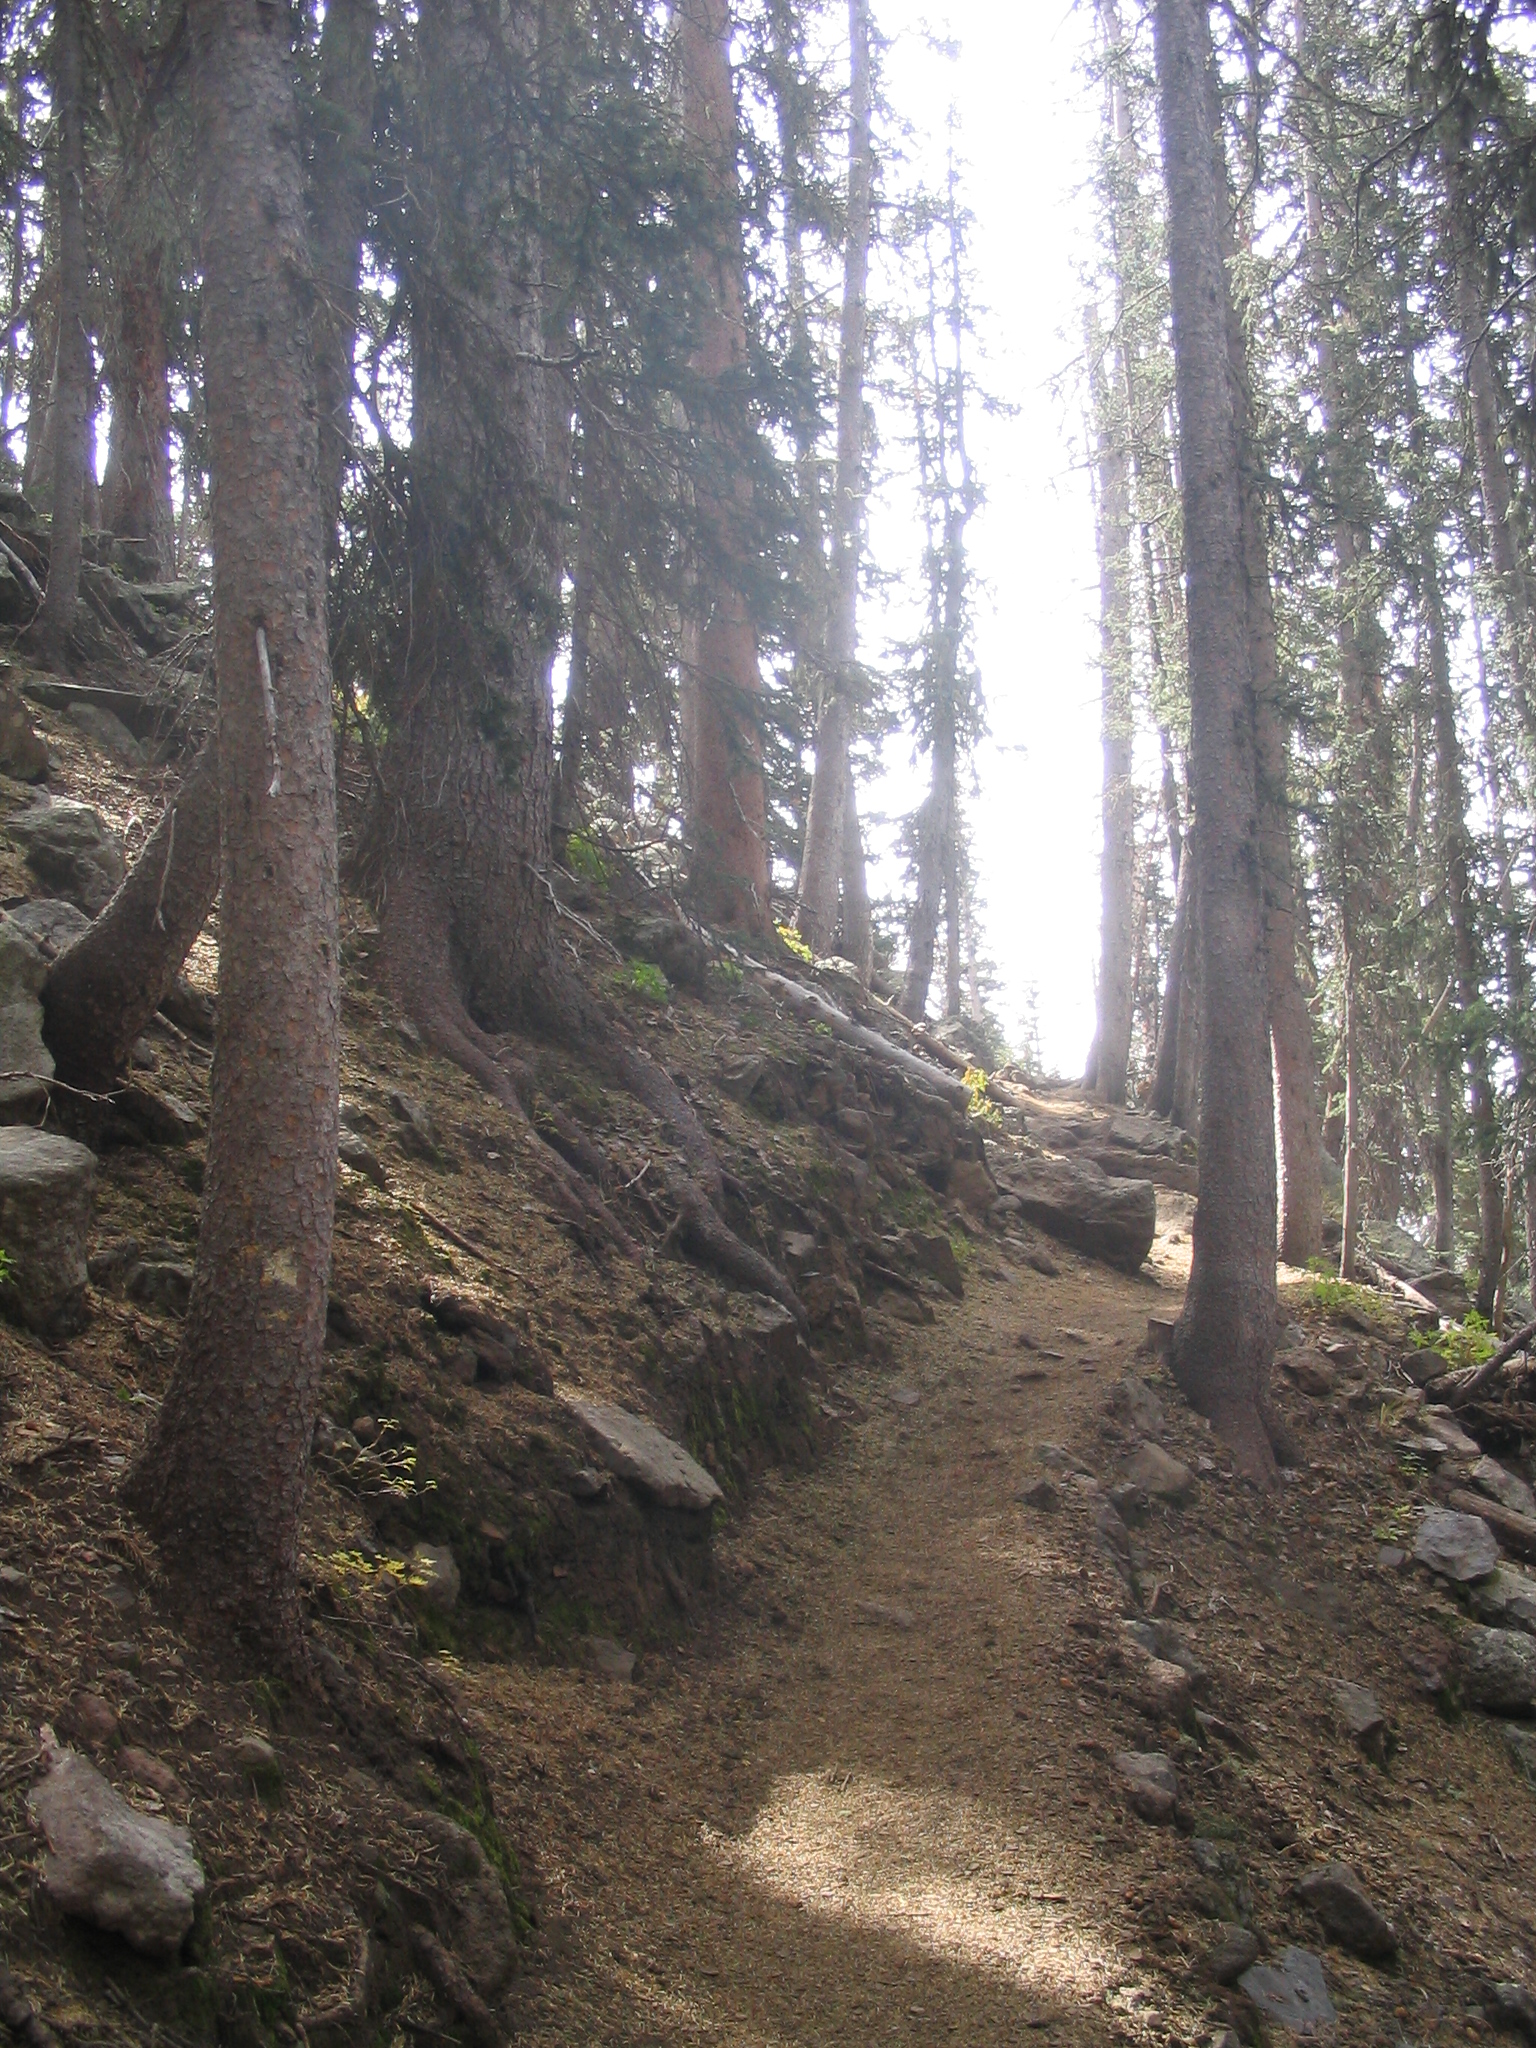 The Path Laid Out Ahead - Humphrey's Peak, AZ